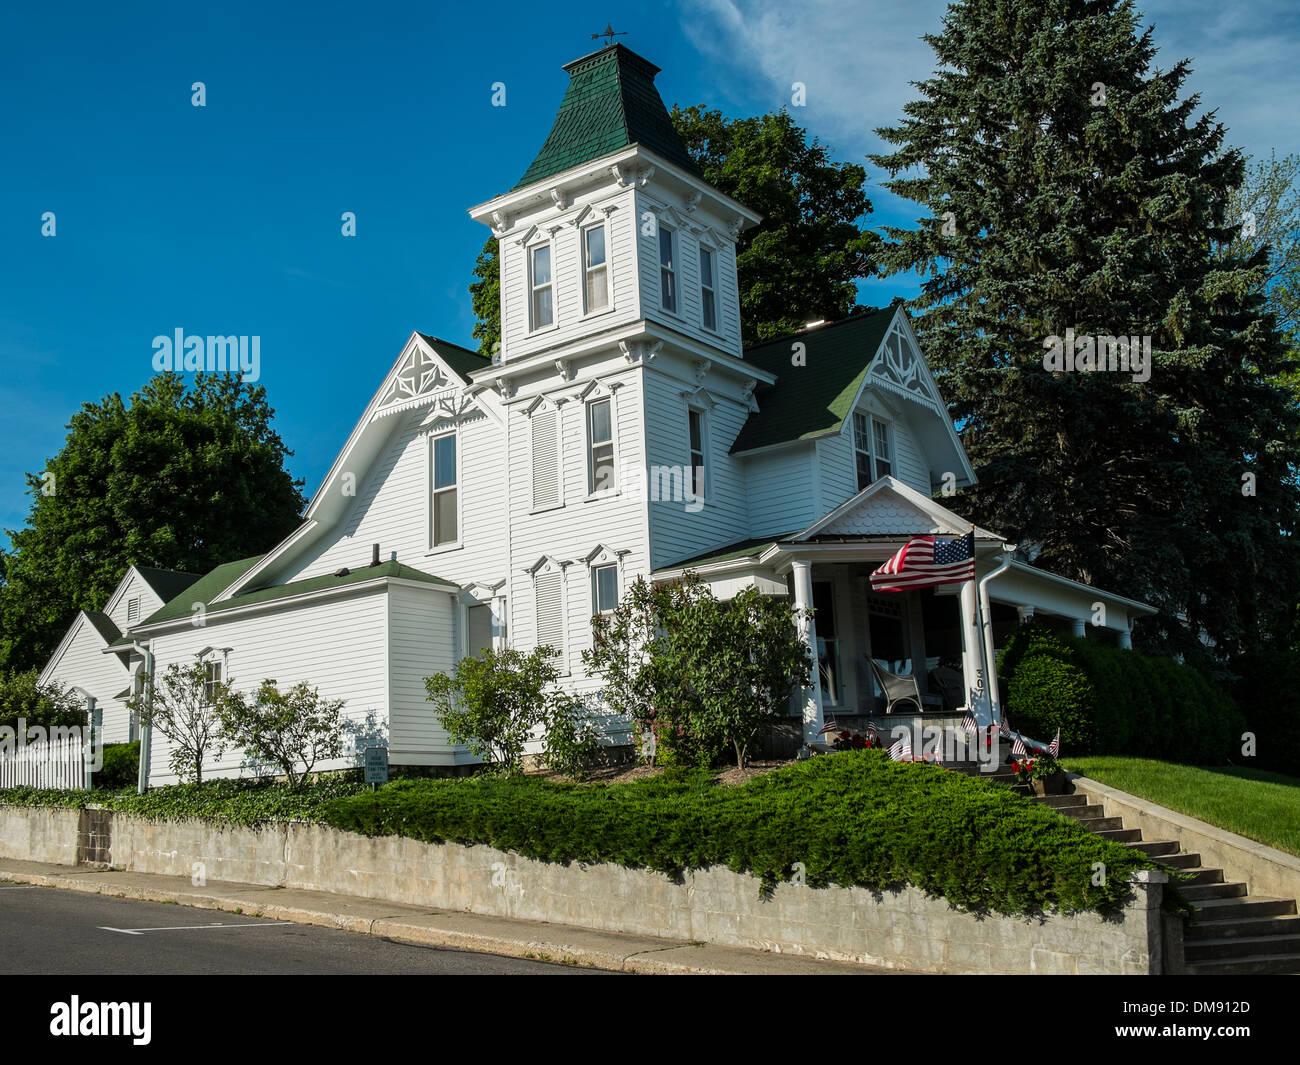 19th century style residence in Harbor Springs, MI - Stock Image